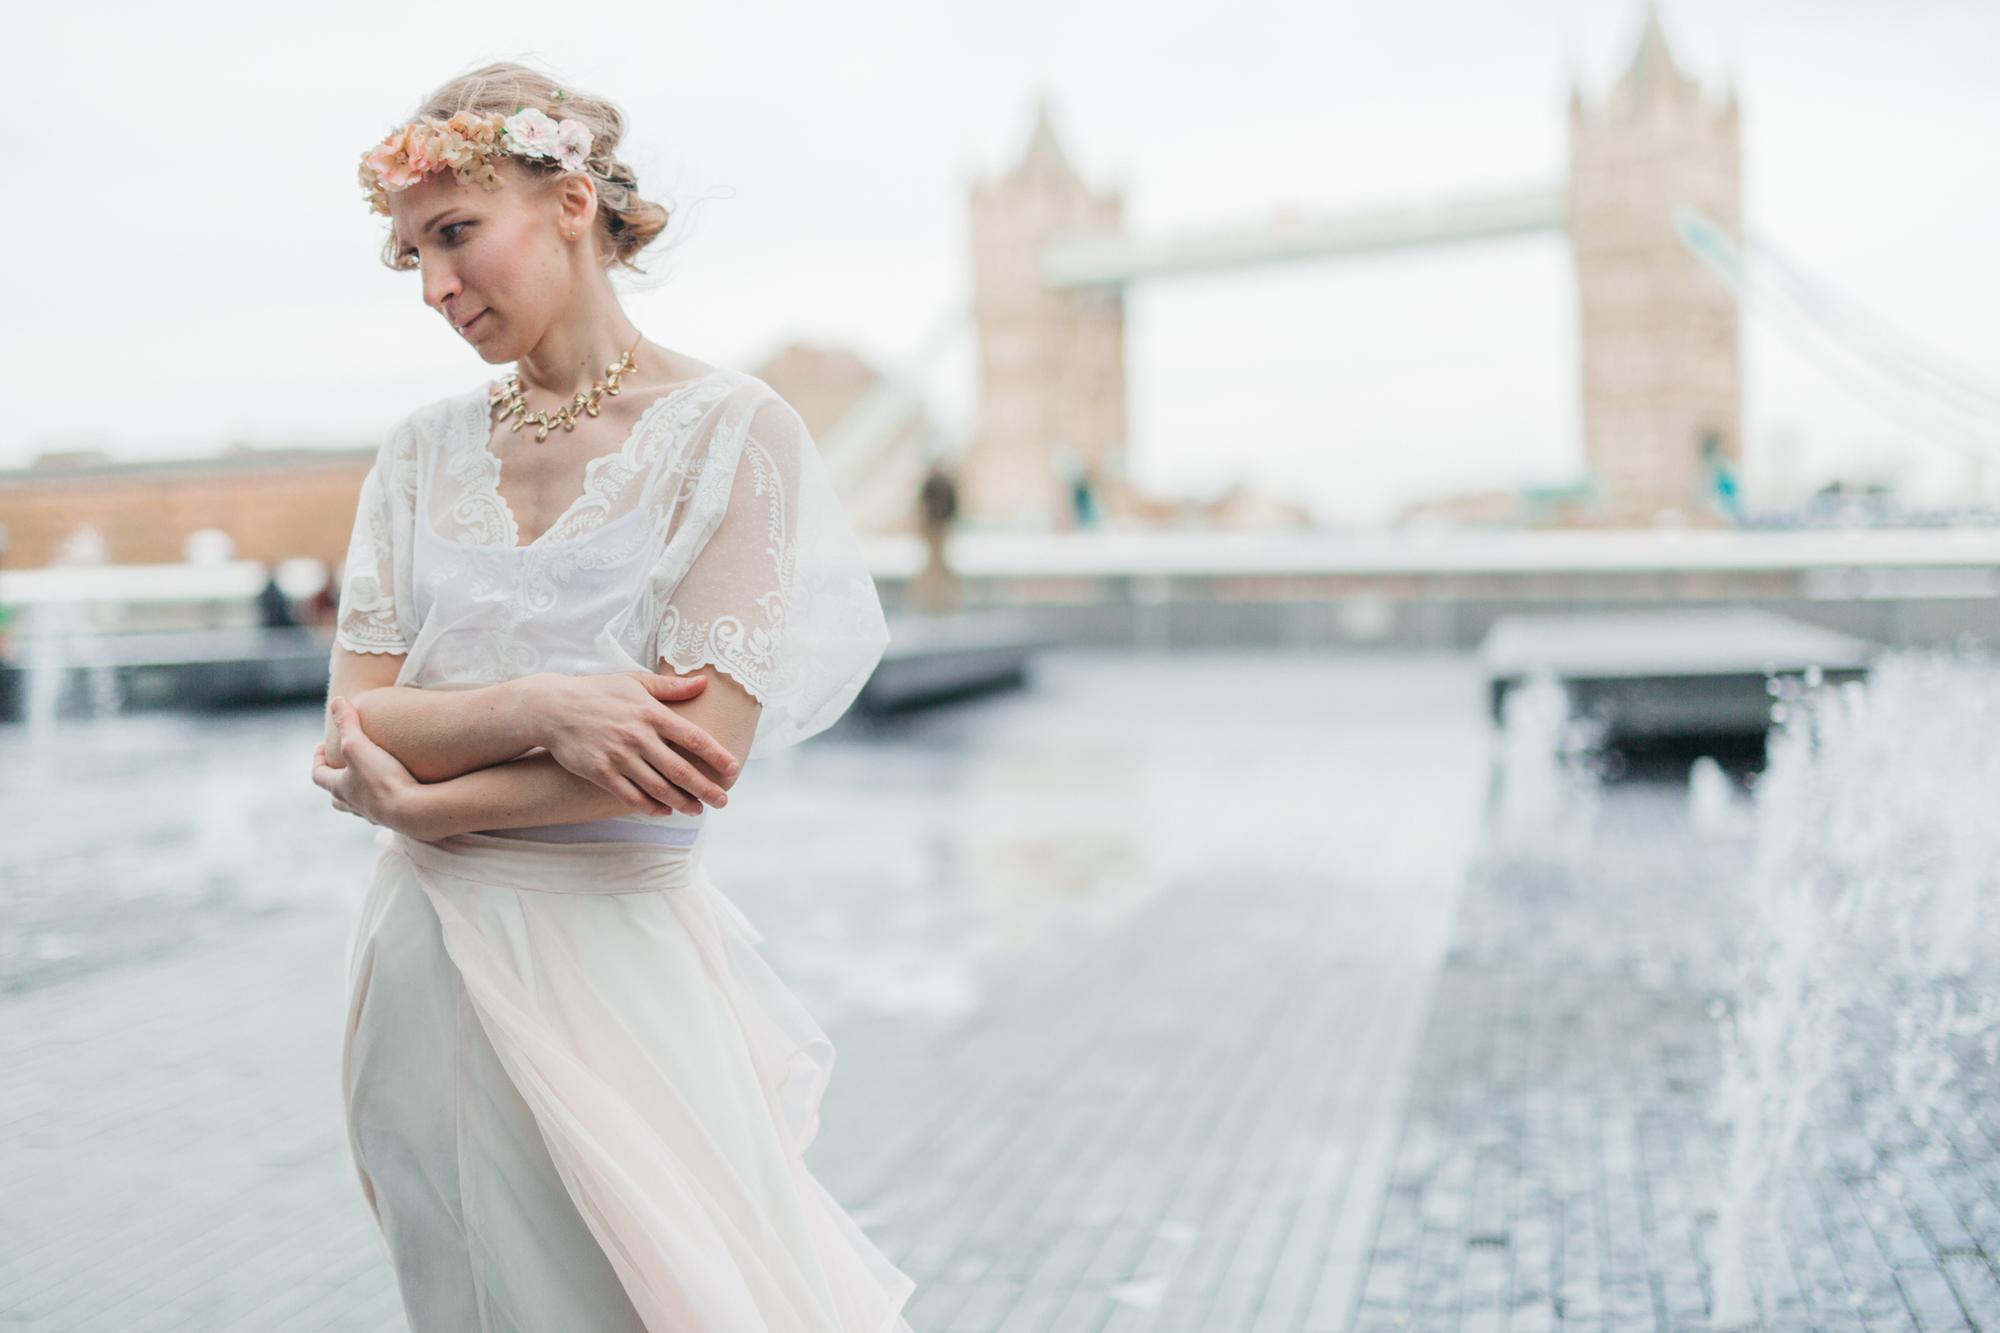 weddingphotographer_lindarehlin_preweddingphoto_london_SensibleM-50.jpg